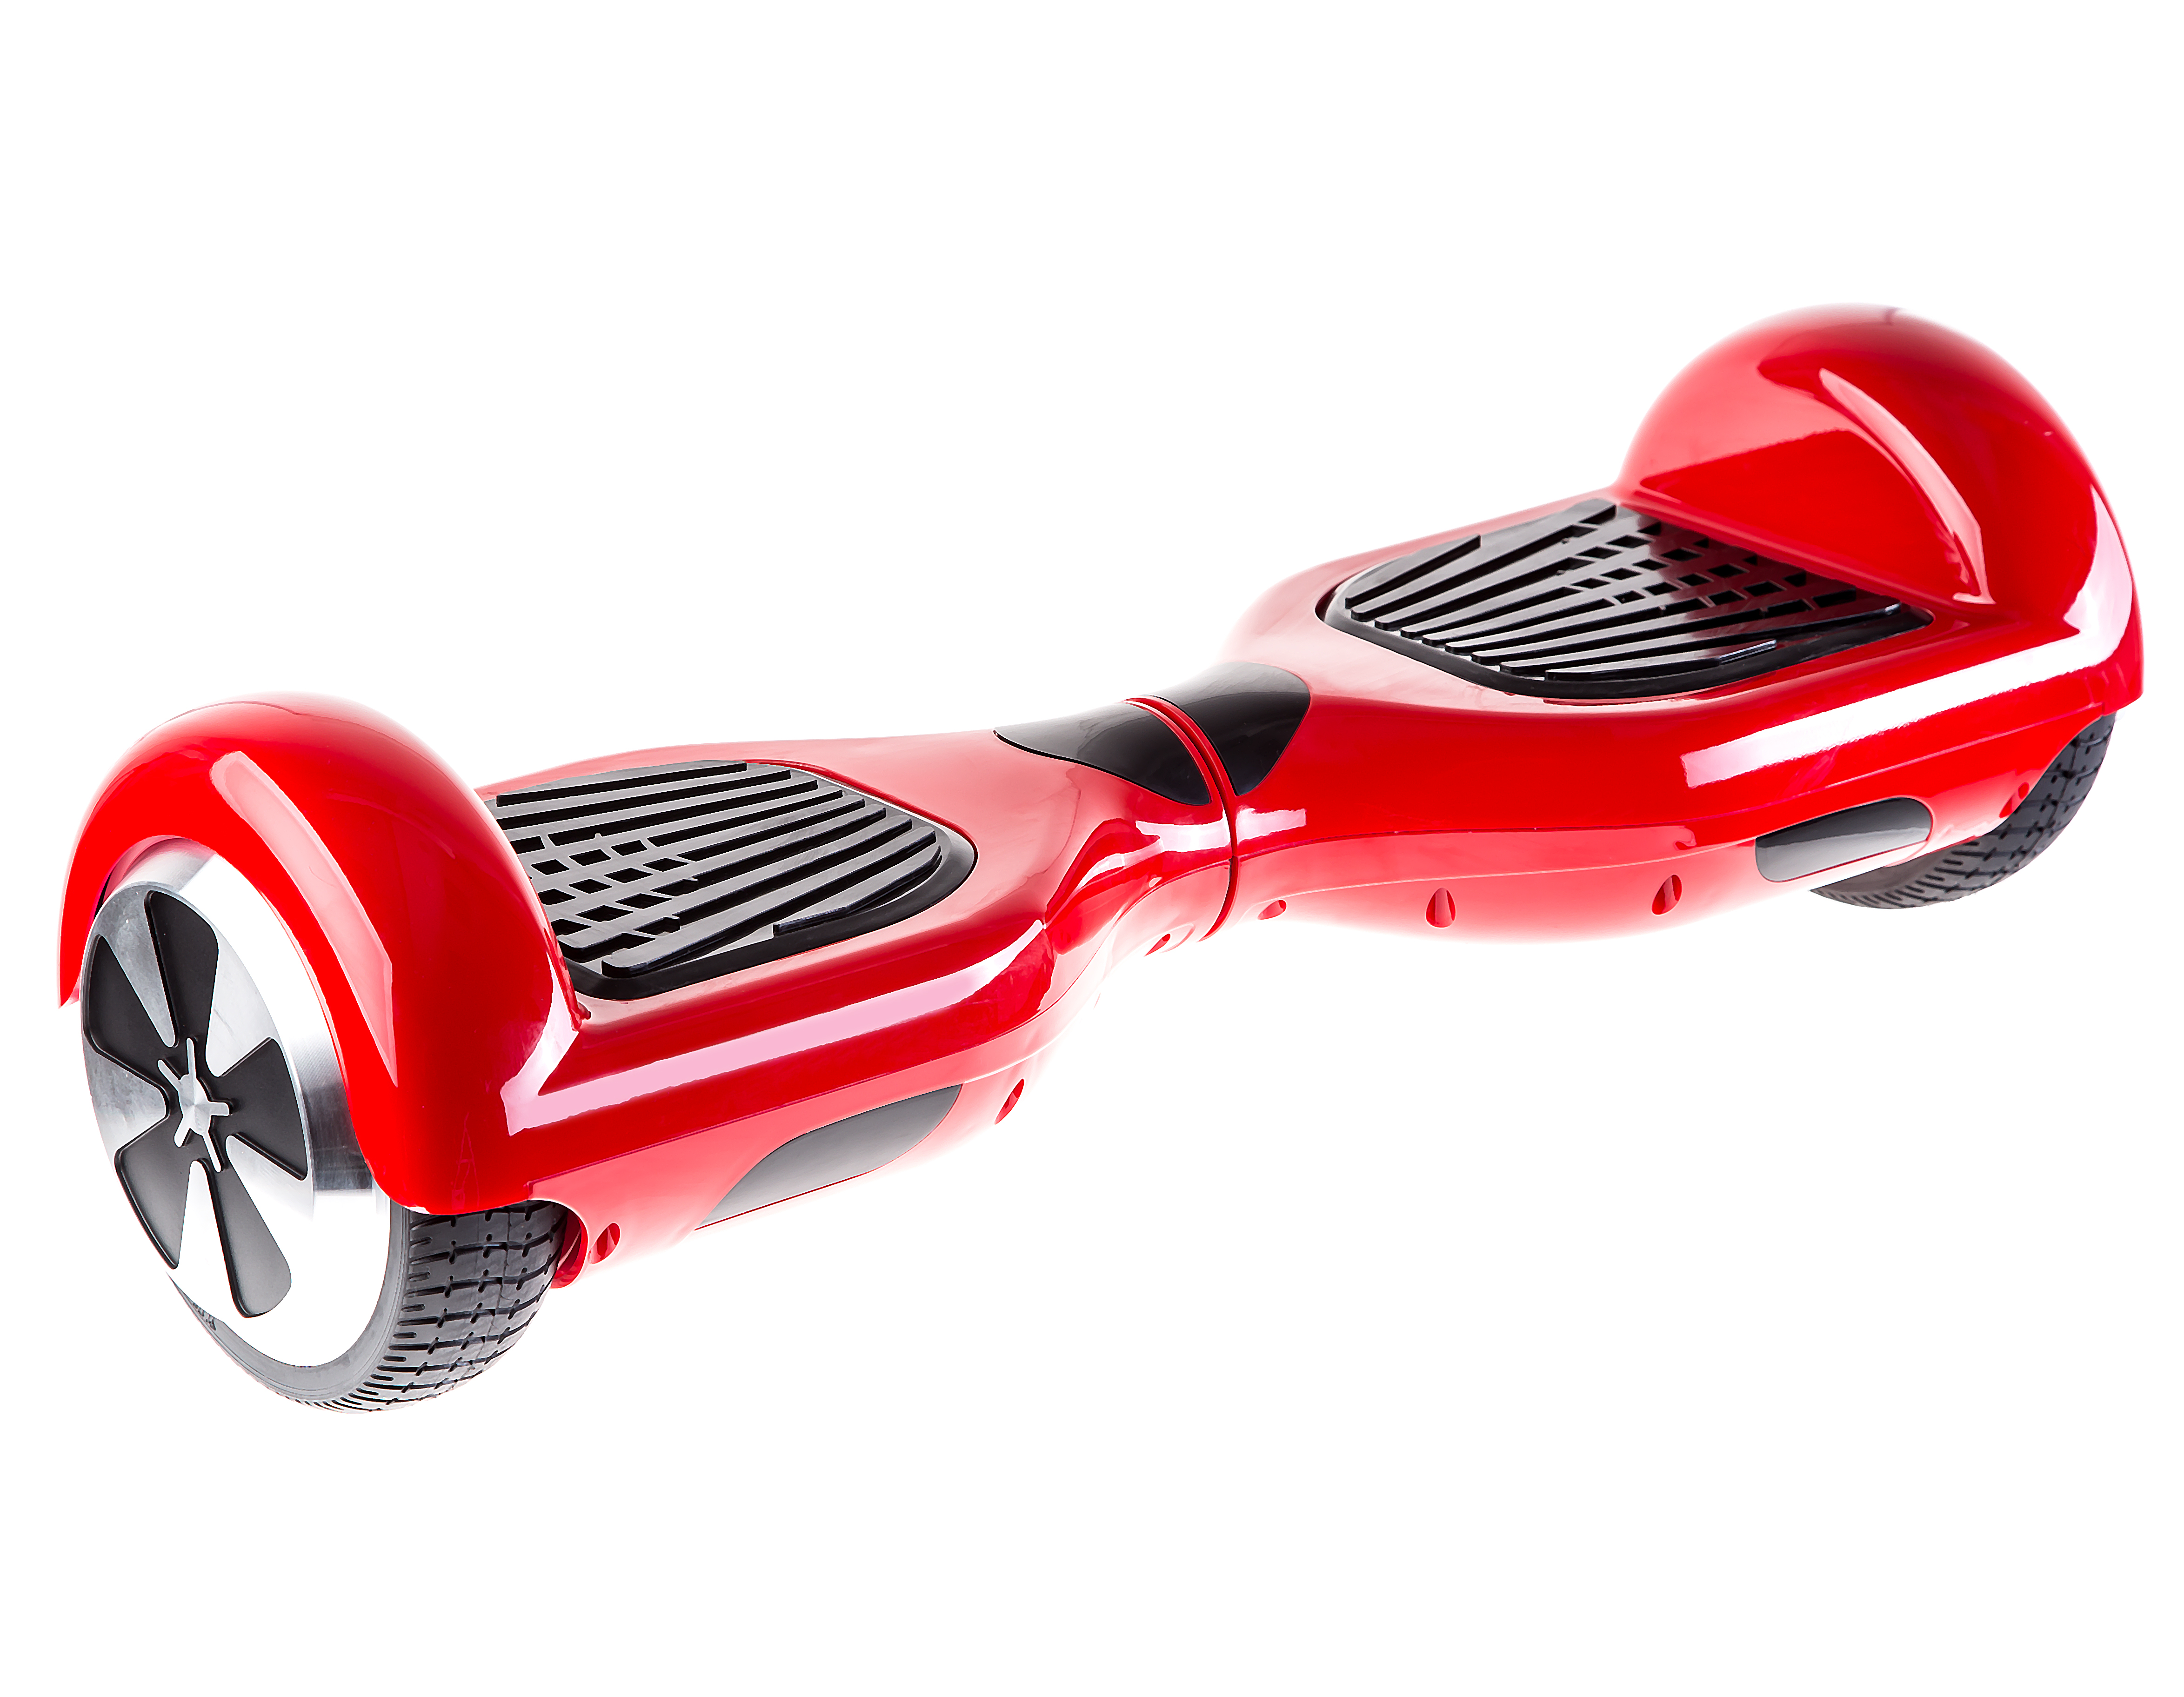 все цены на  Гироскутер Superbsail Slx-001/6,5 красный  онлайн